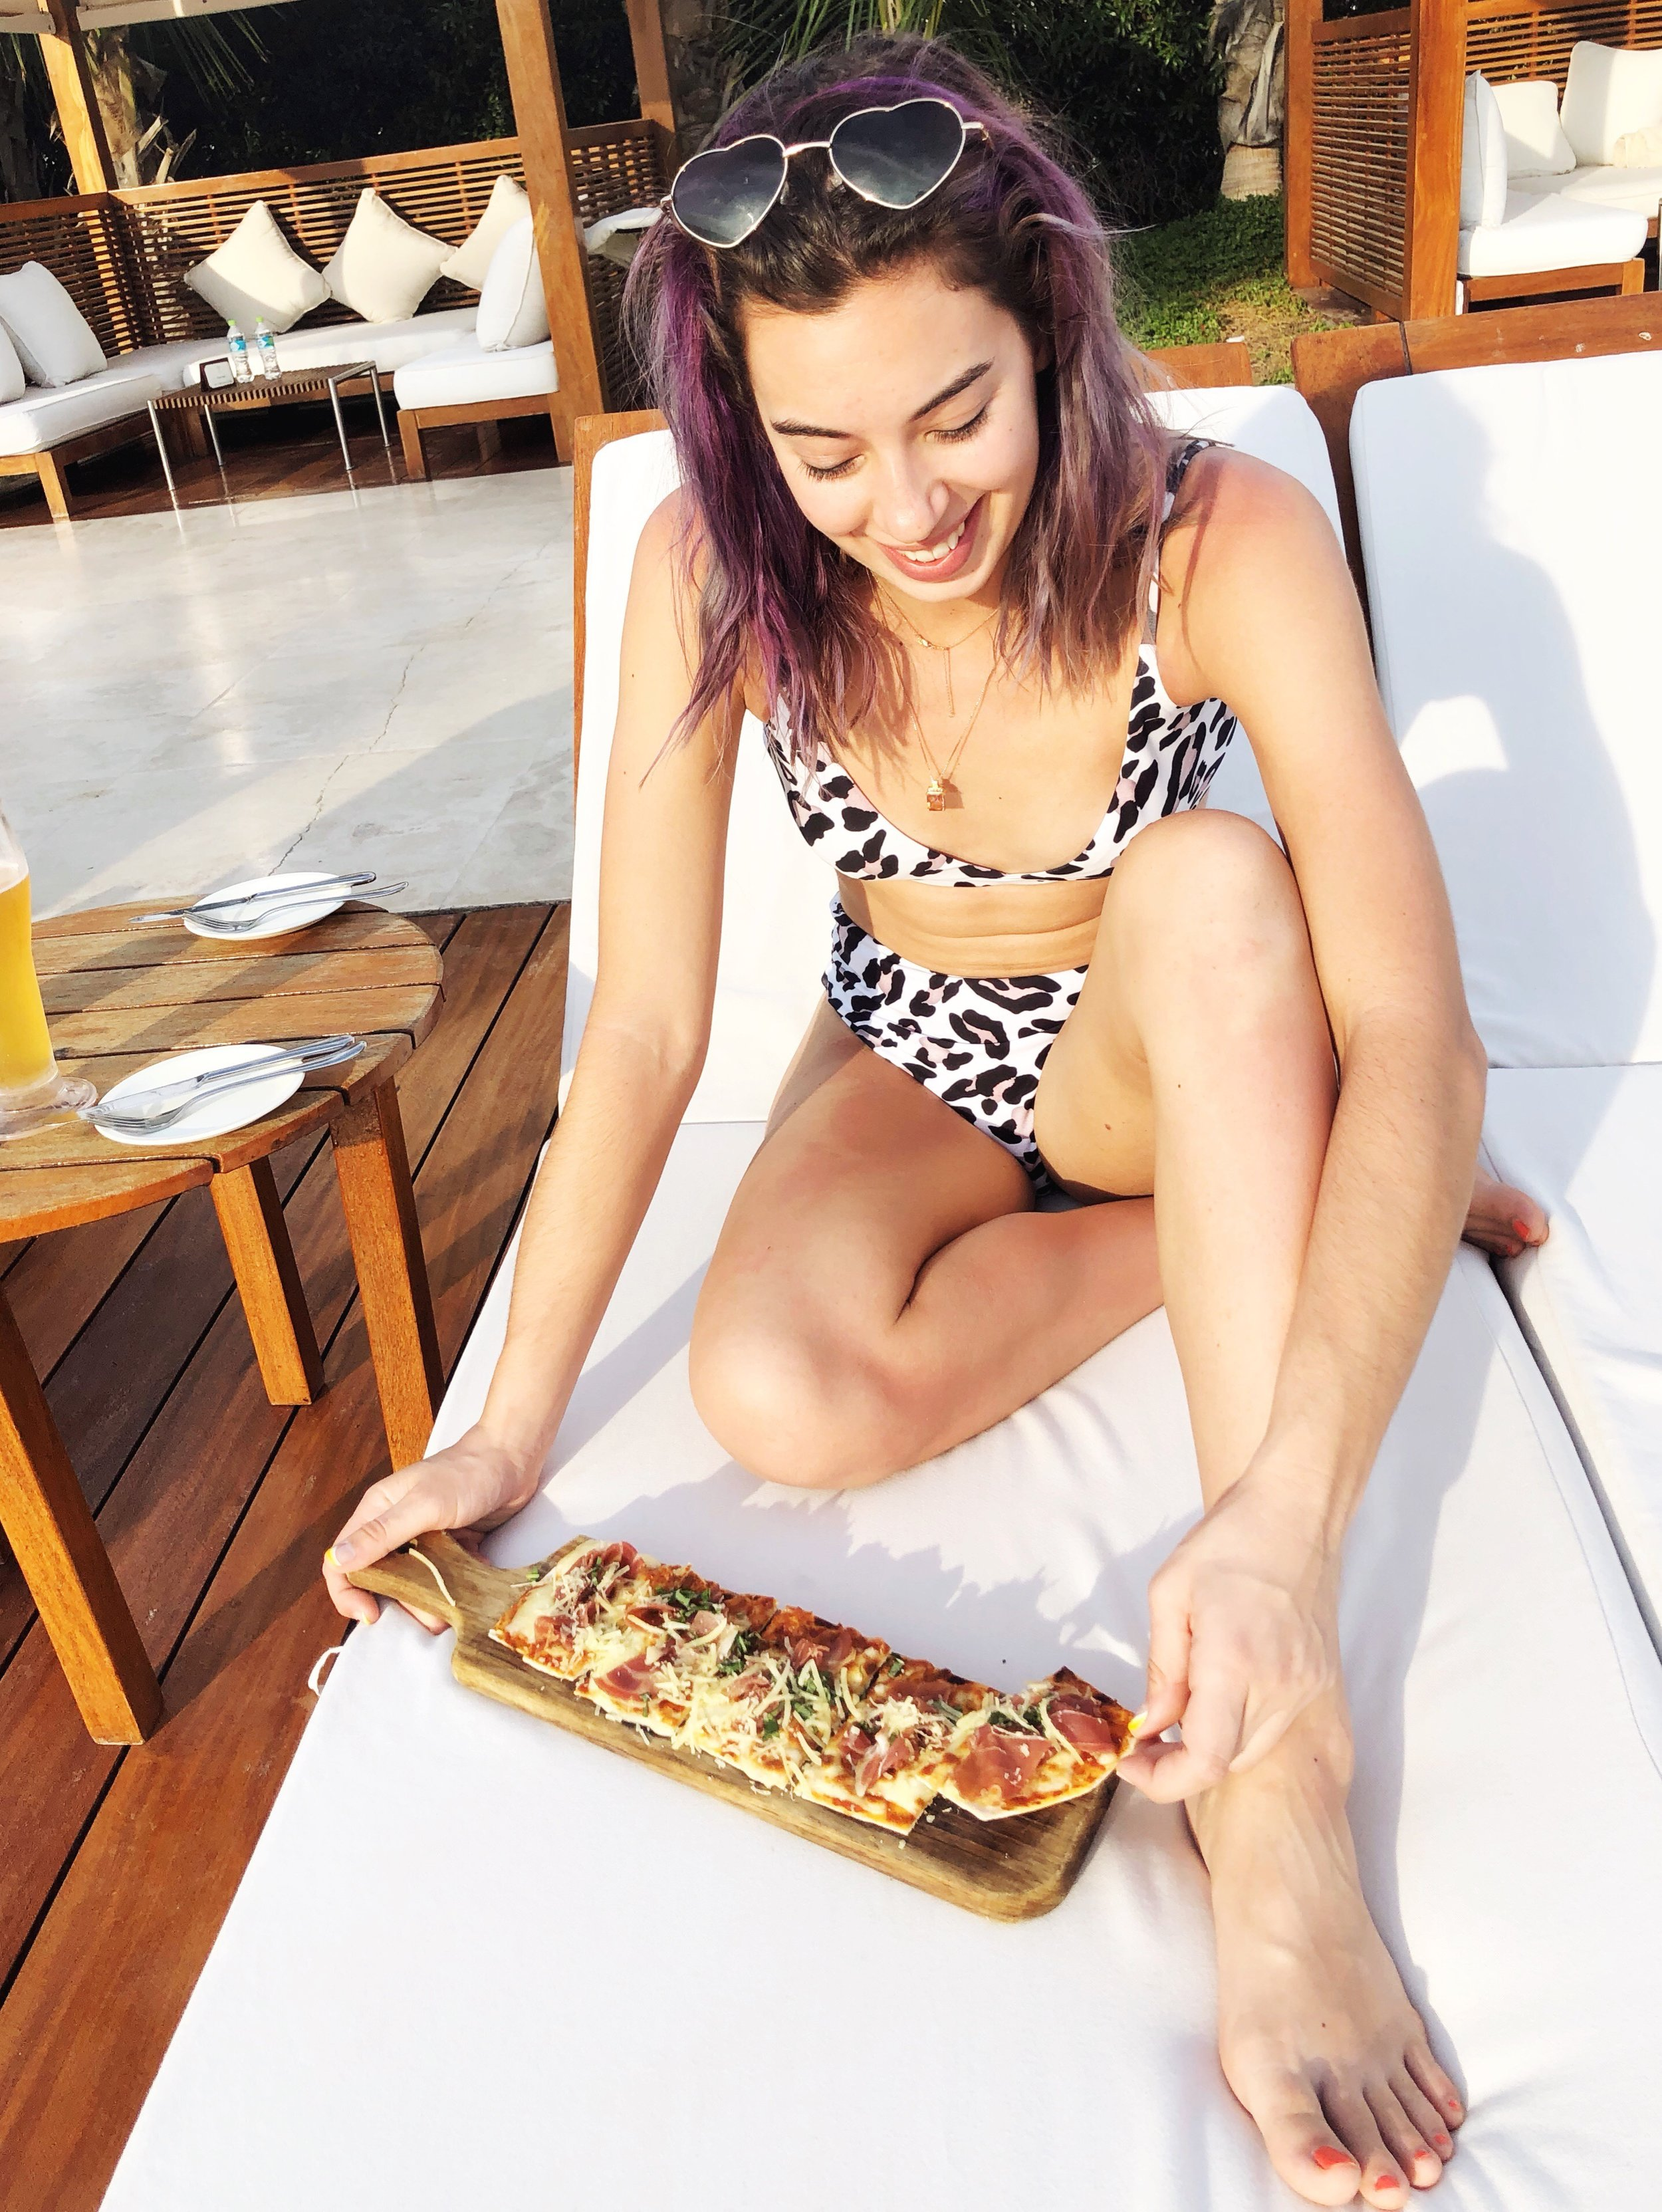 paracas-hotel-beach-peru-south-america-zahara swim - bikini - pizza